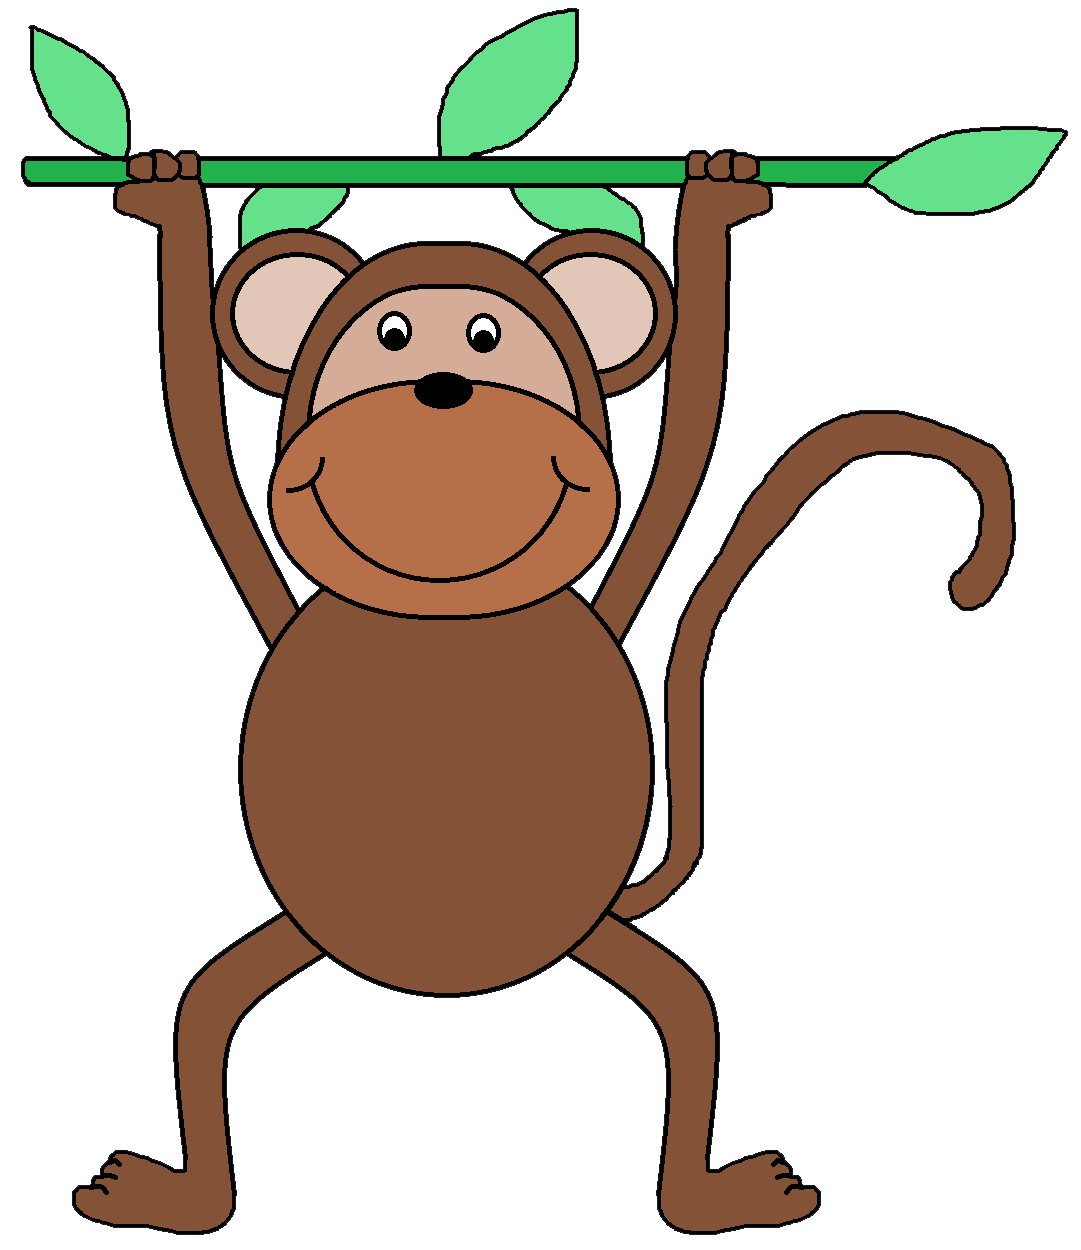 Monkey clip art for teachers free clipart images 4